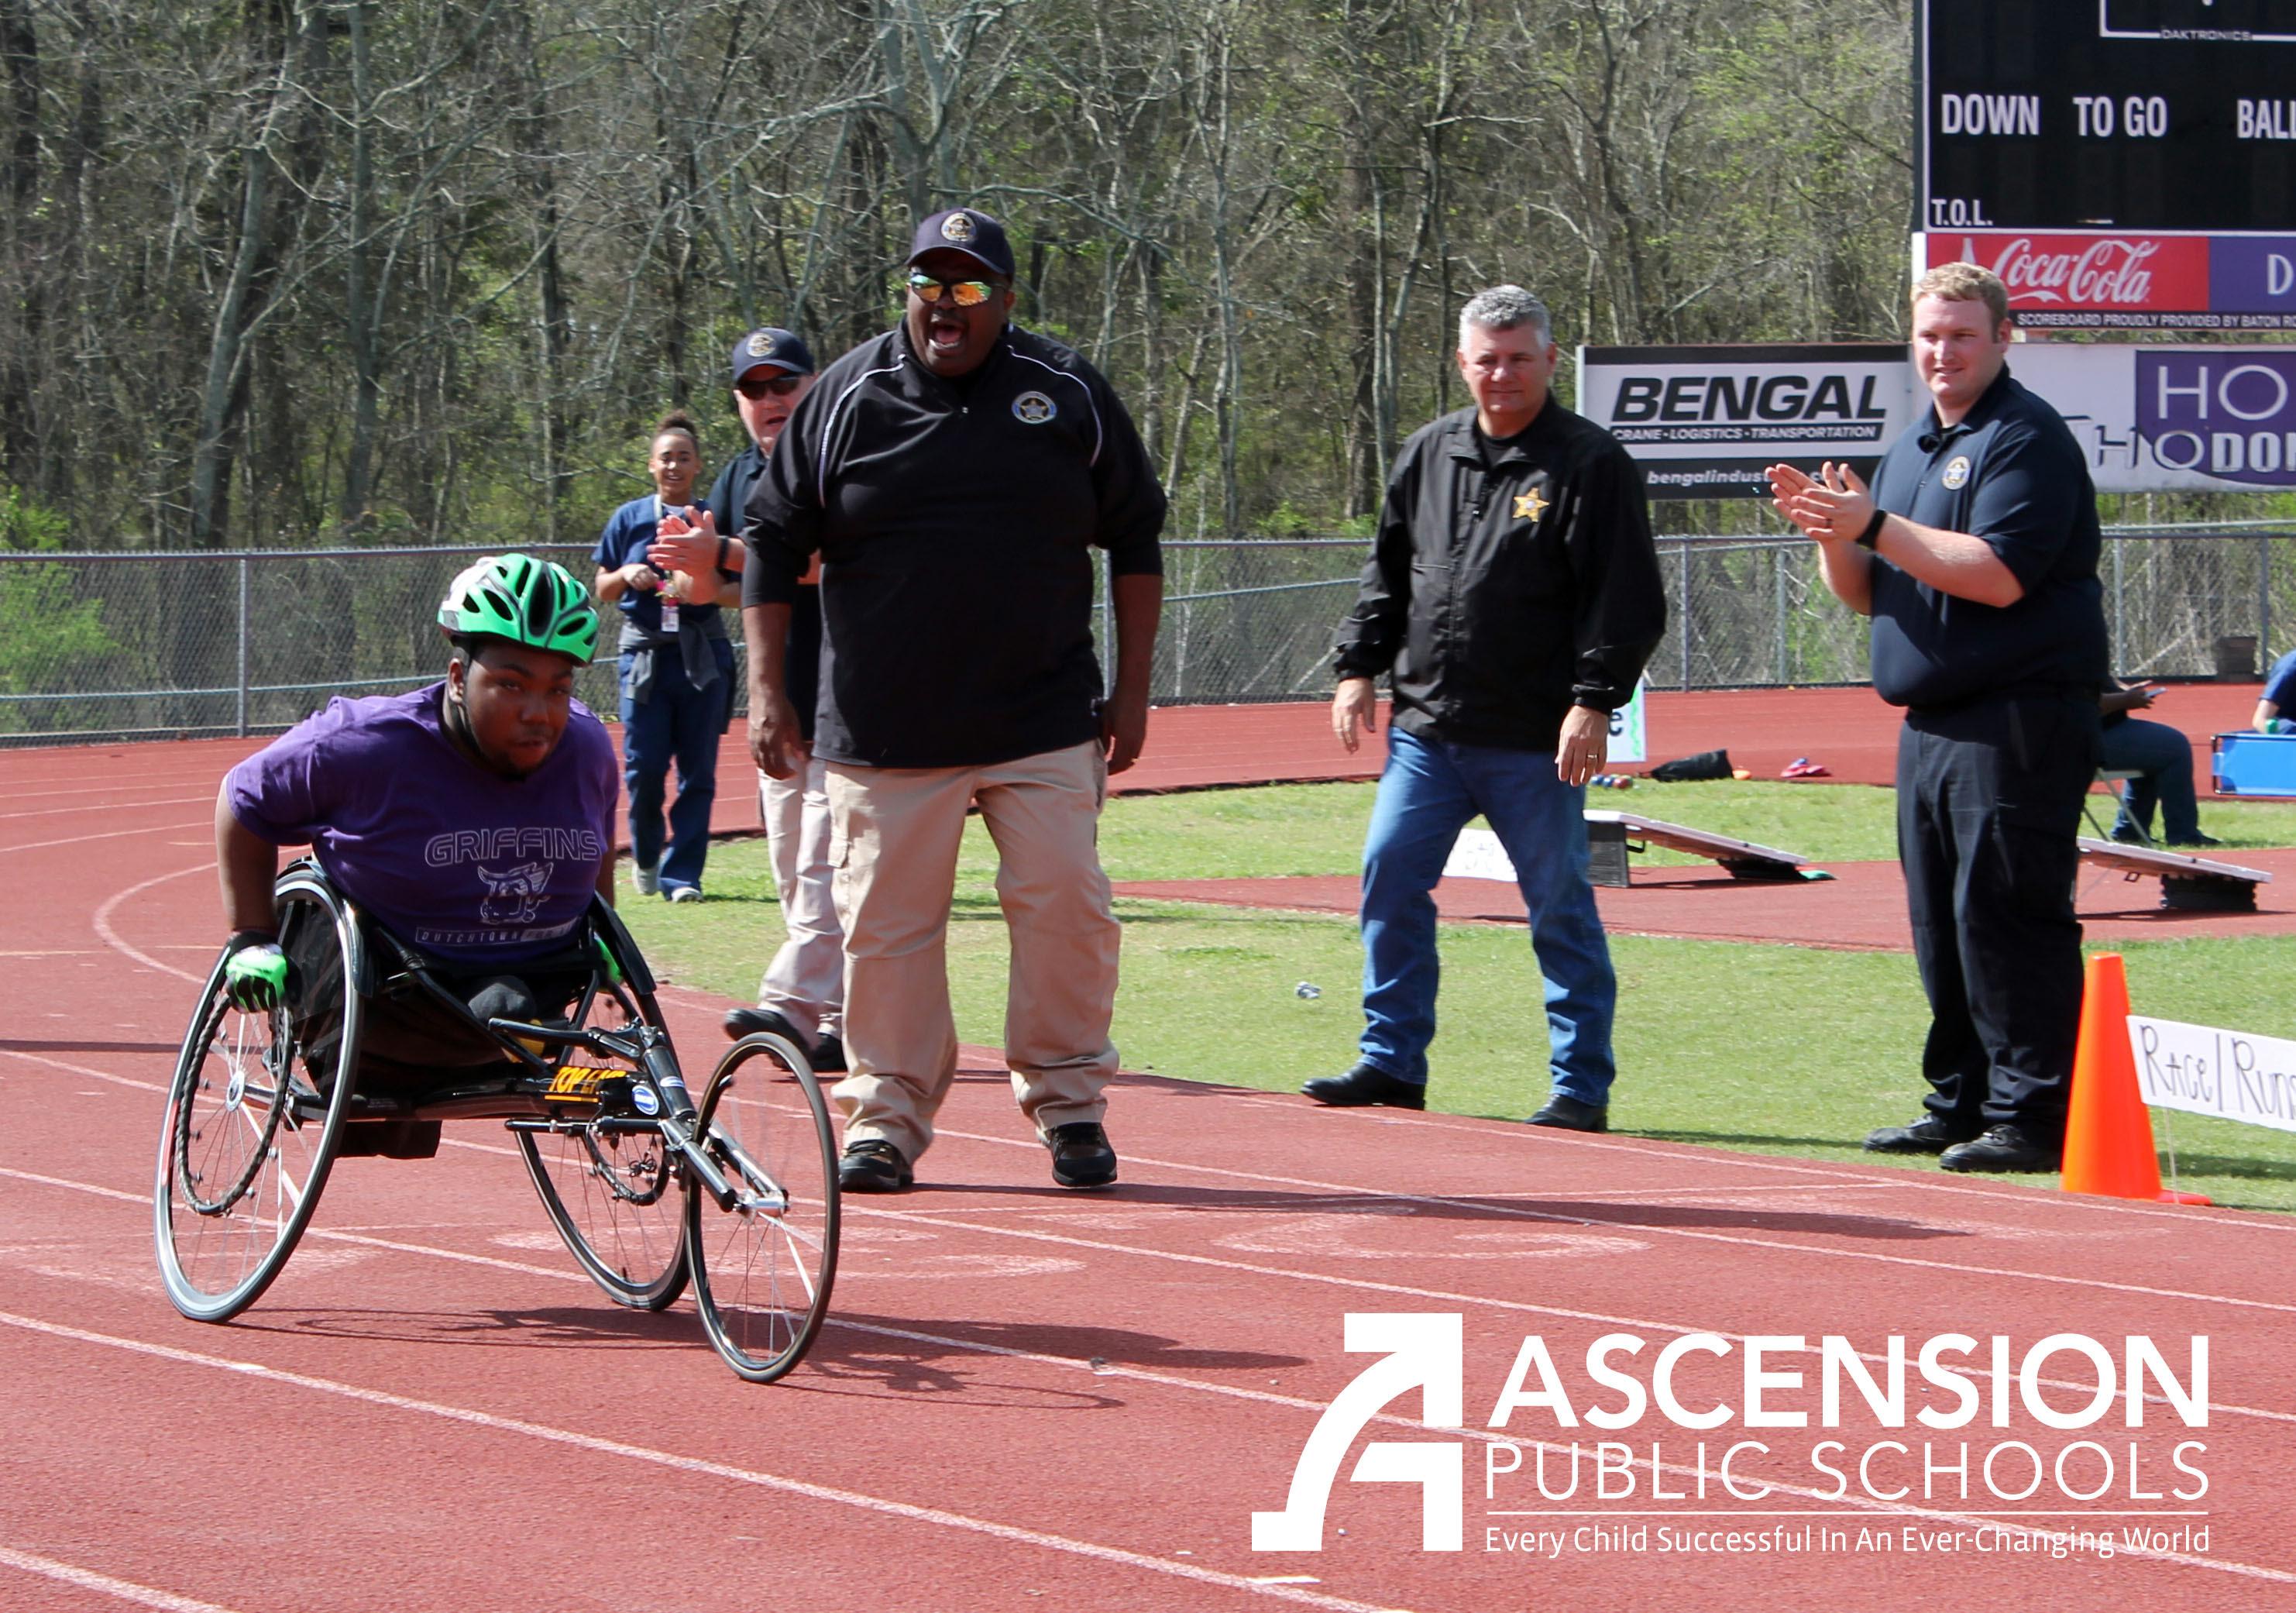 APSO staff cheer as K'Von races in his wheelchair